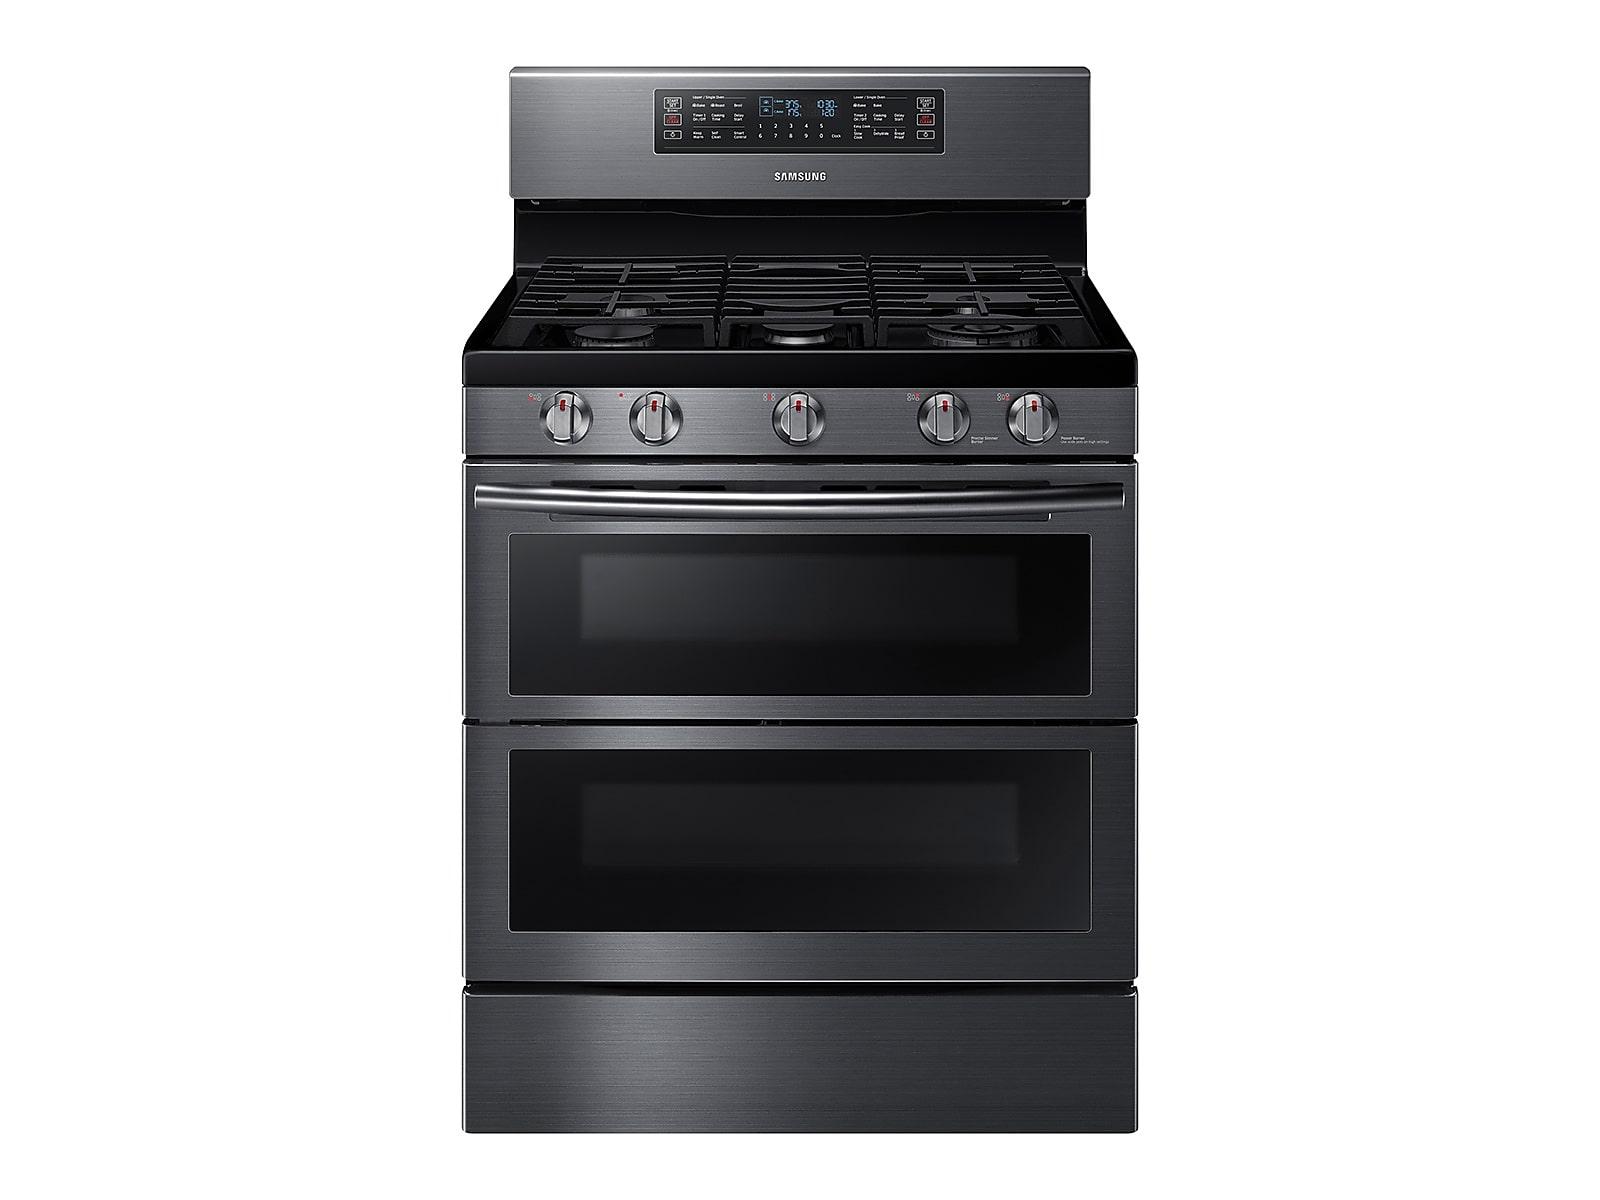 Samsung 5.8 cu. ft. Freestanding Gas Range with Flex Duo™ & Dual Door in Black Stainless Steel(NX58K7850SG/AA)